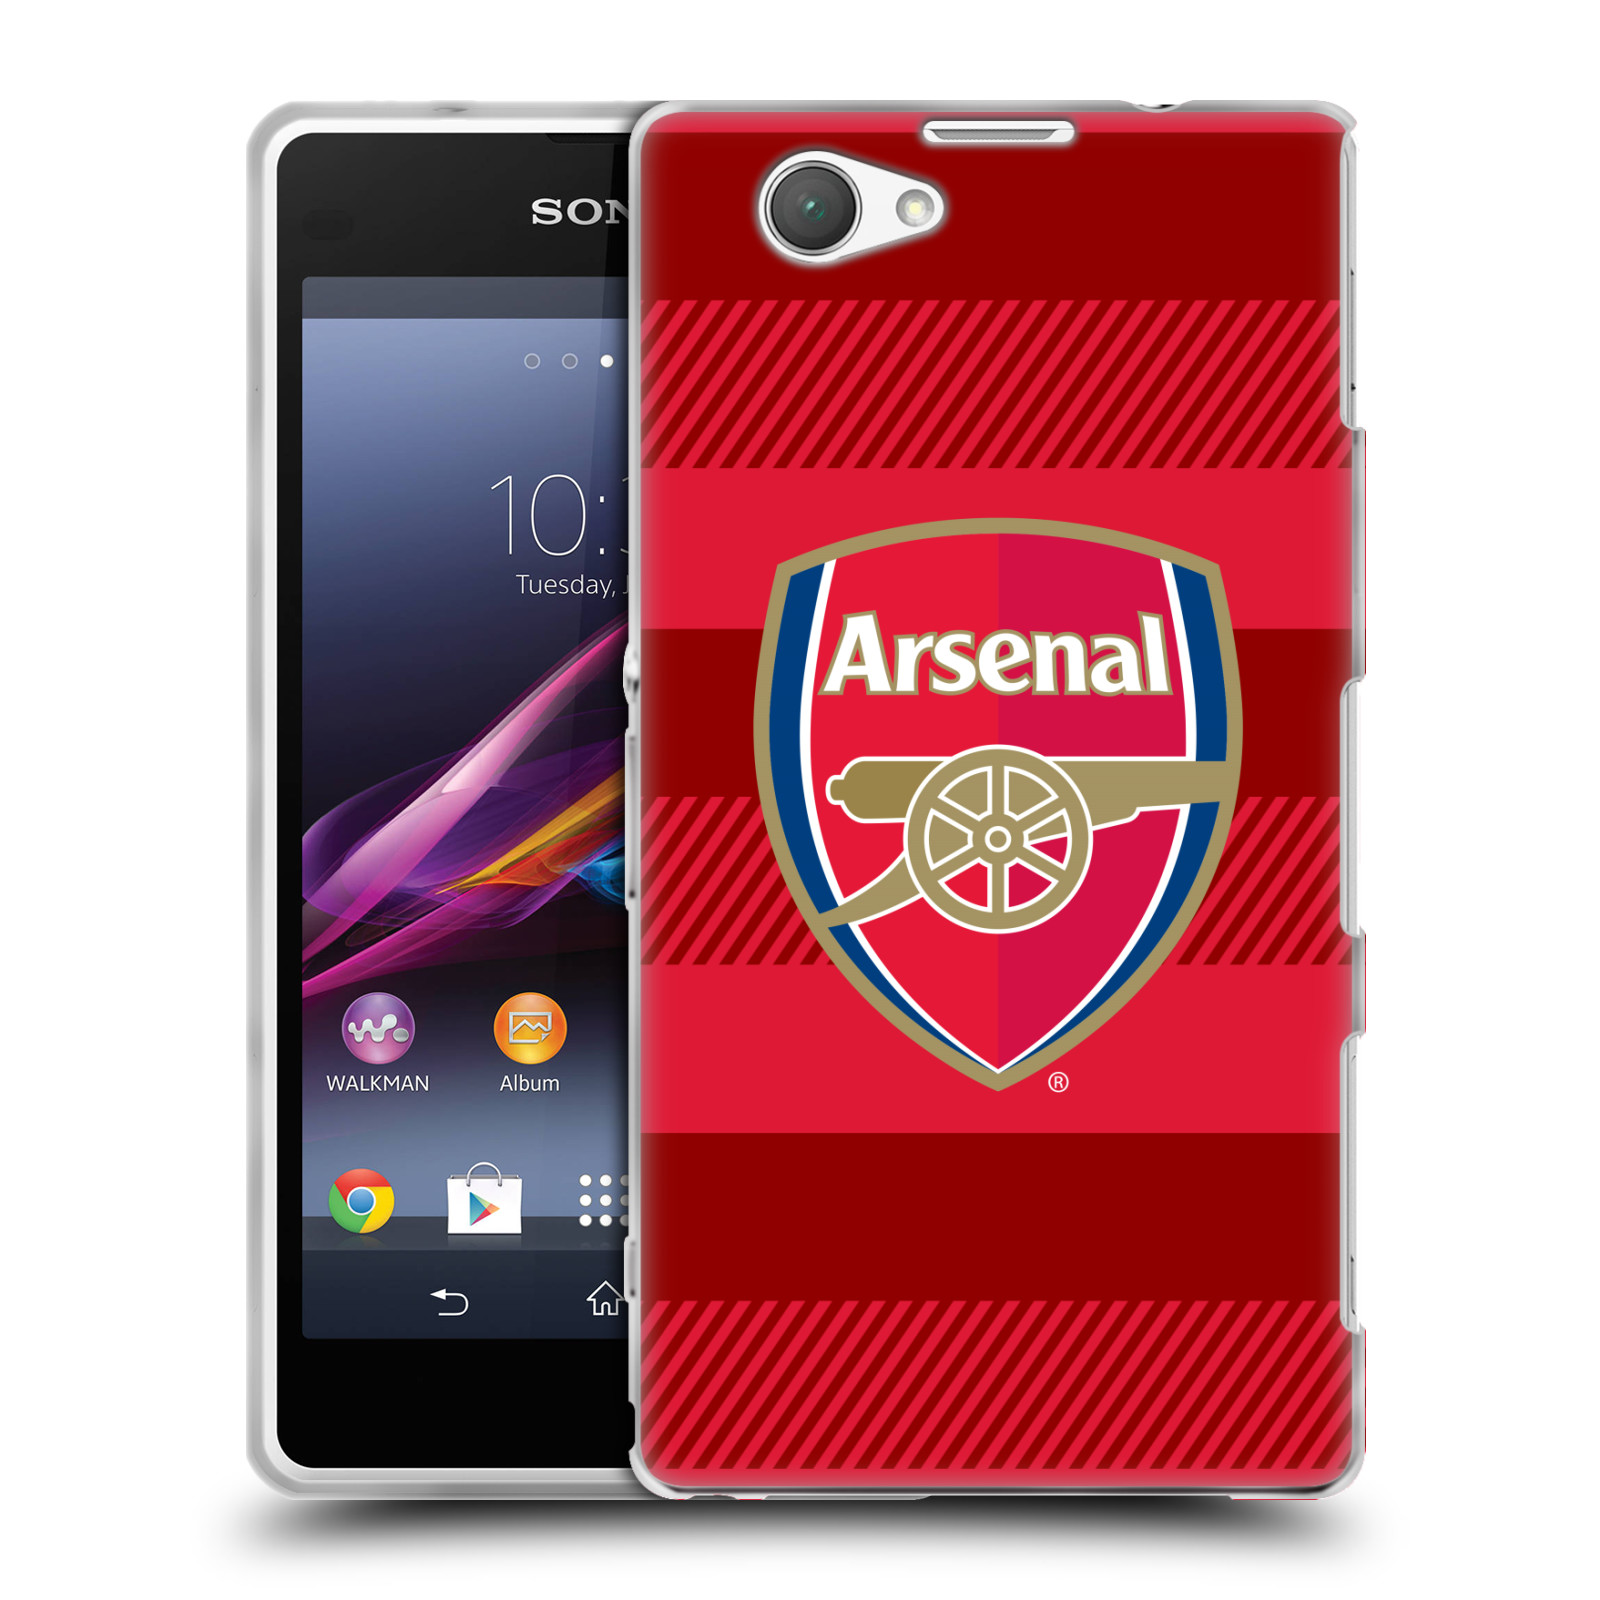 Silikonové pouzdro na mobil Sony Xperia Z1 Compact D5503 - Head Case - Arsenal FC - Logo s pruhy